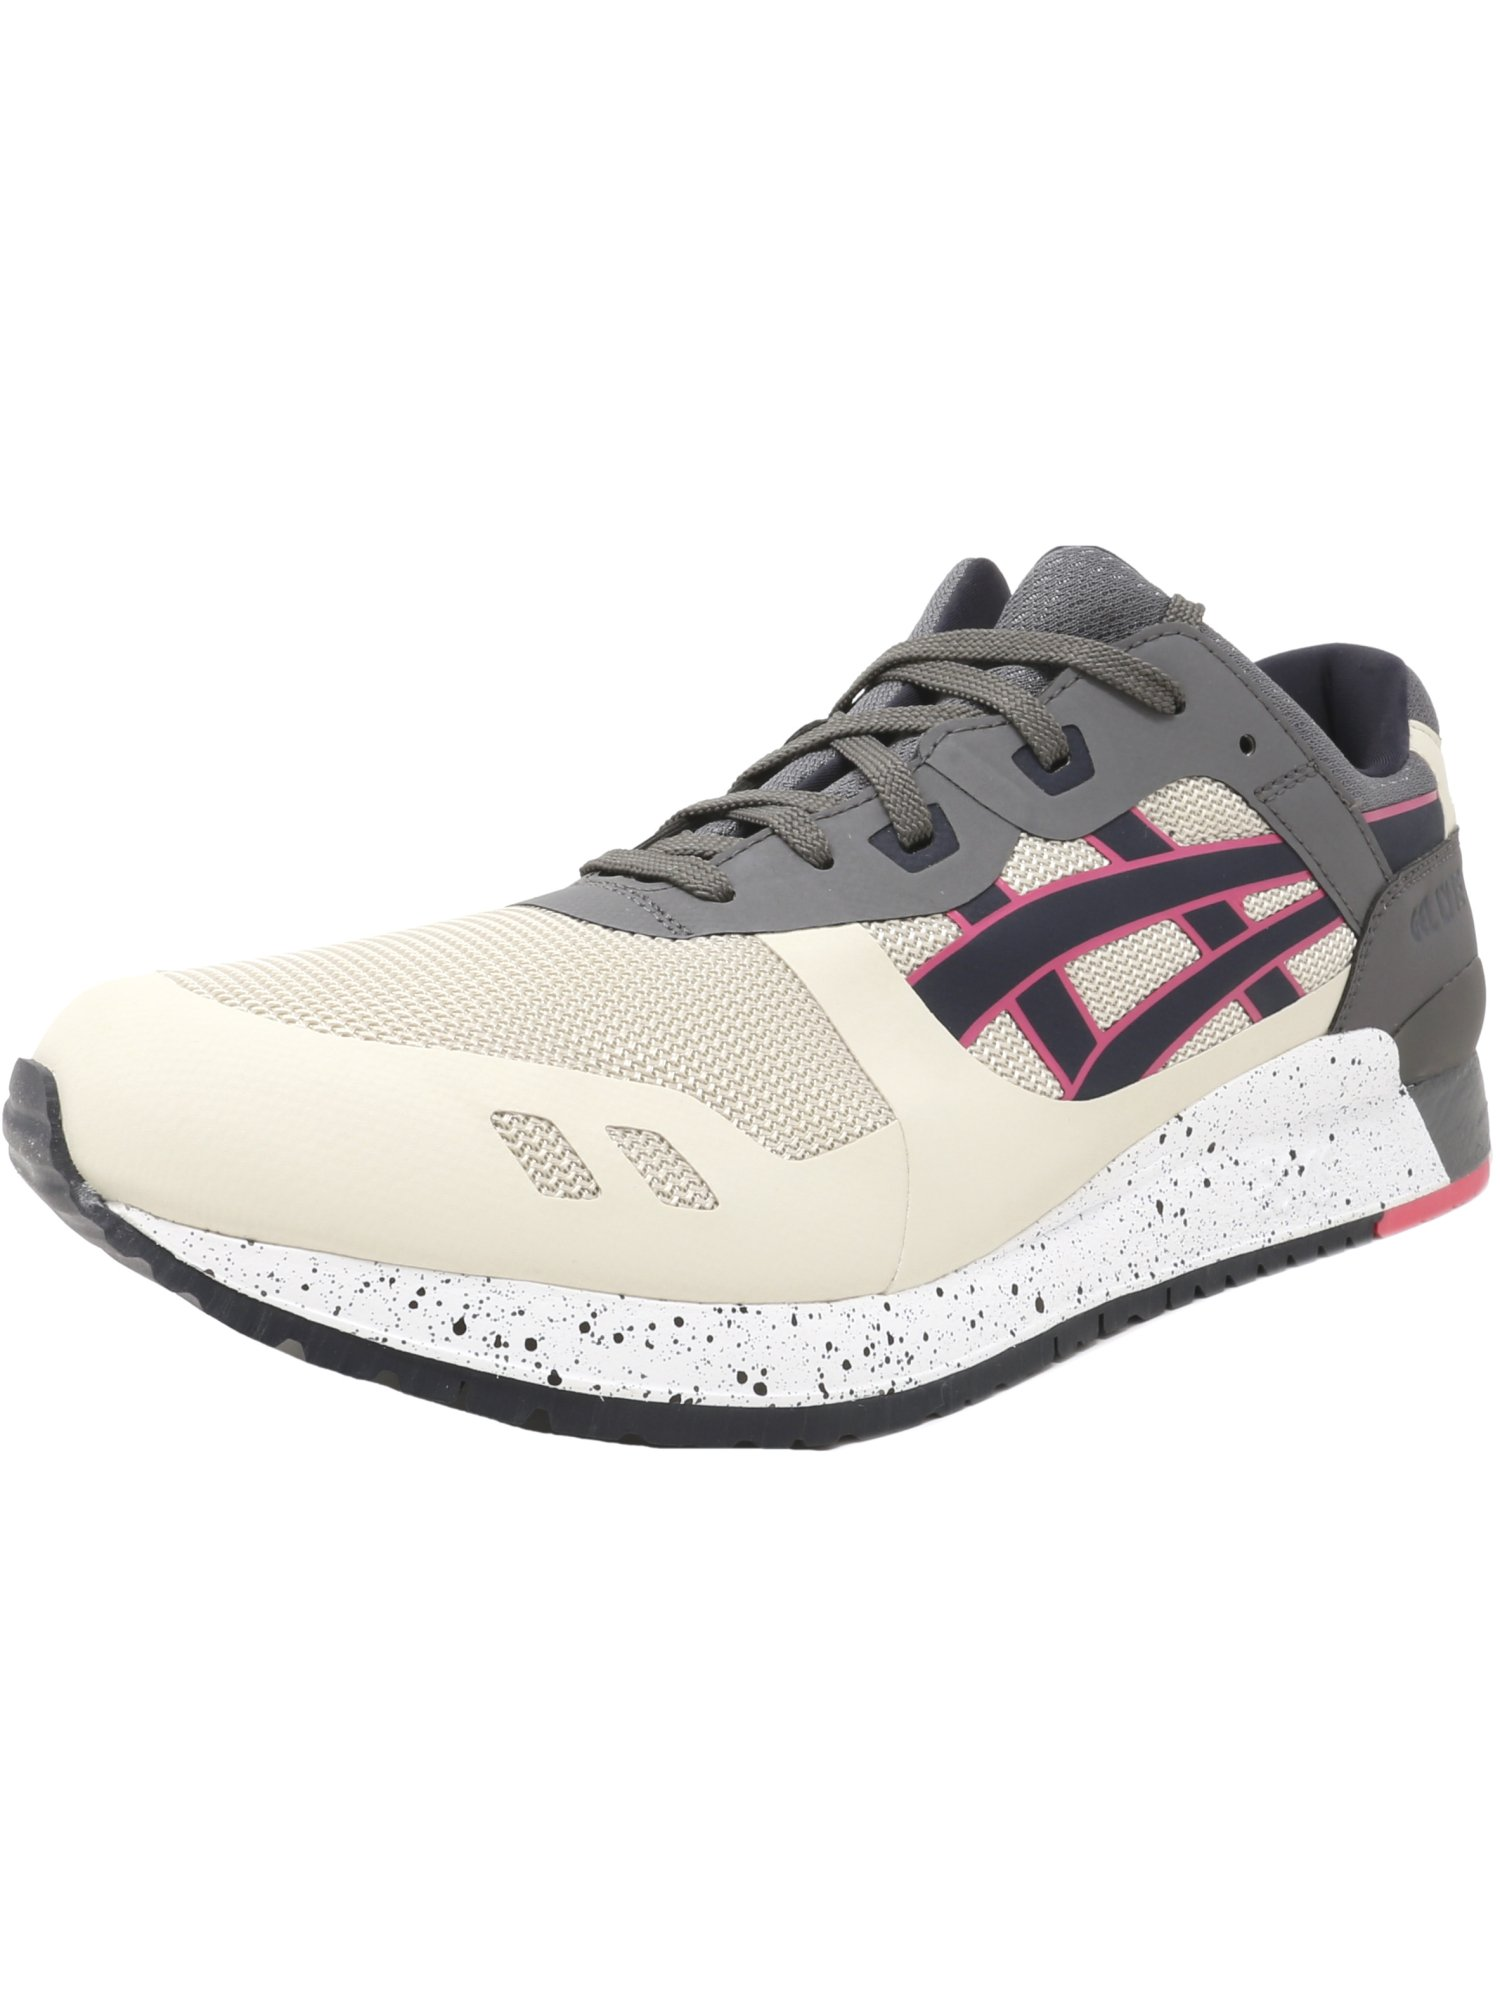 ASICS Mens Gel Lyte III Encre NS 9 Sneaker 19667 Fashion Blanc/ Inde Encre 9 M 8ad79f4 - dudymovie.website